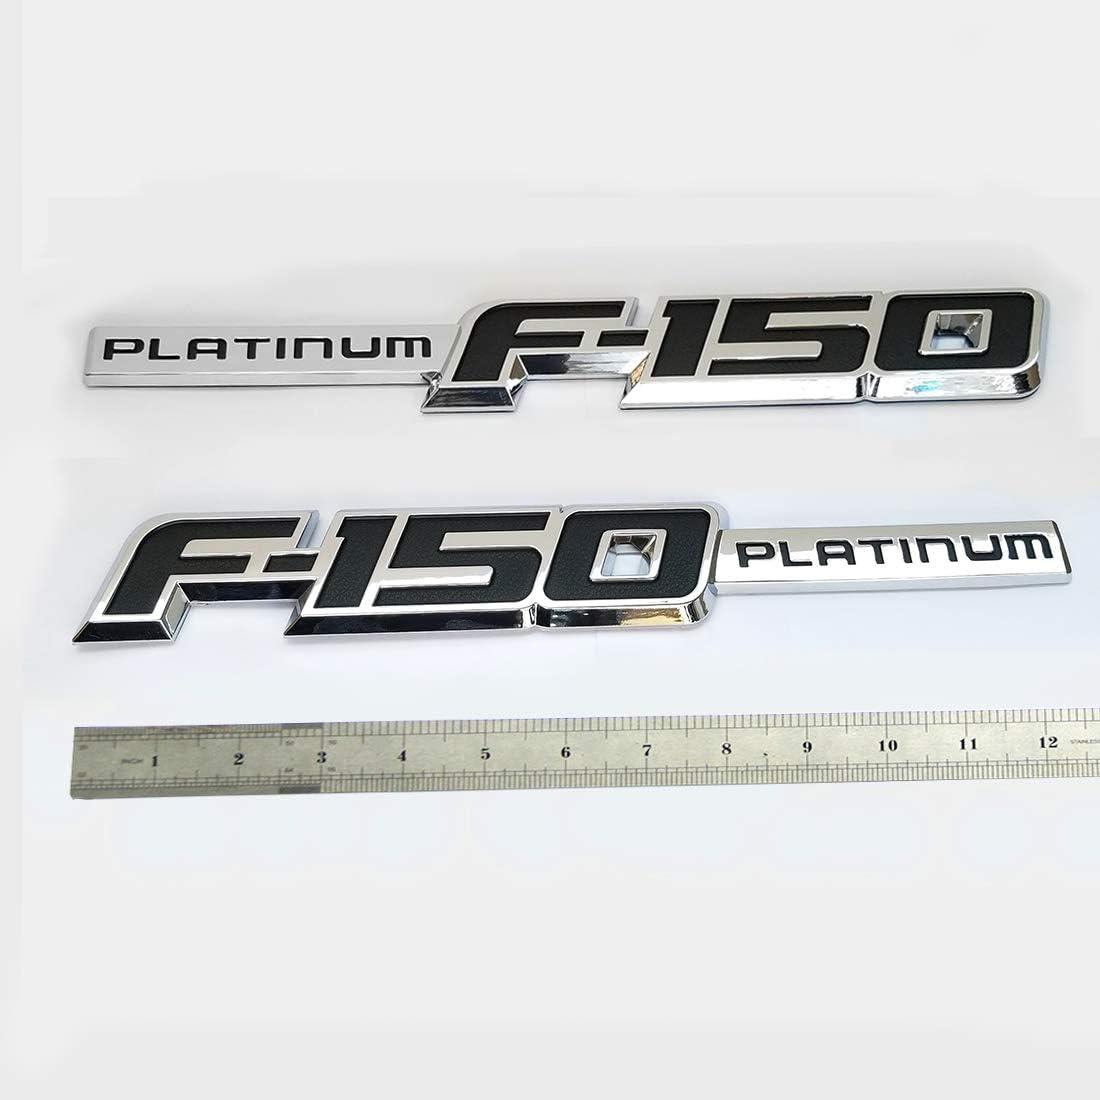 2pcs OEM F-150 Platinum Badge Emblem Side Fender 3D Logo Nameplate Replacement for F150 Chrome Black Origianl Size Genuine Parts